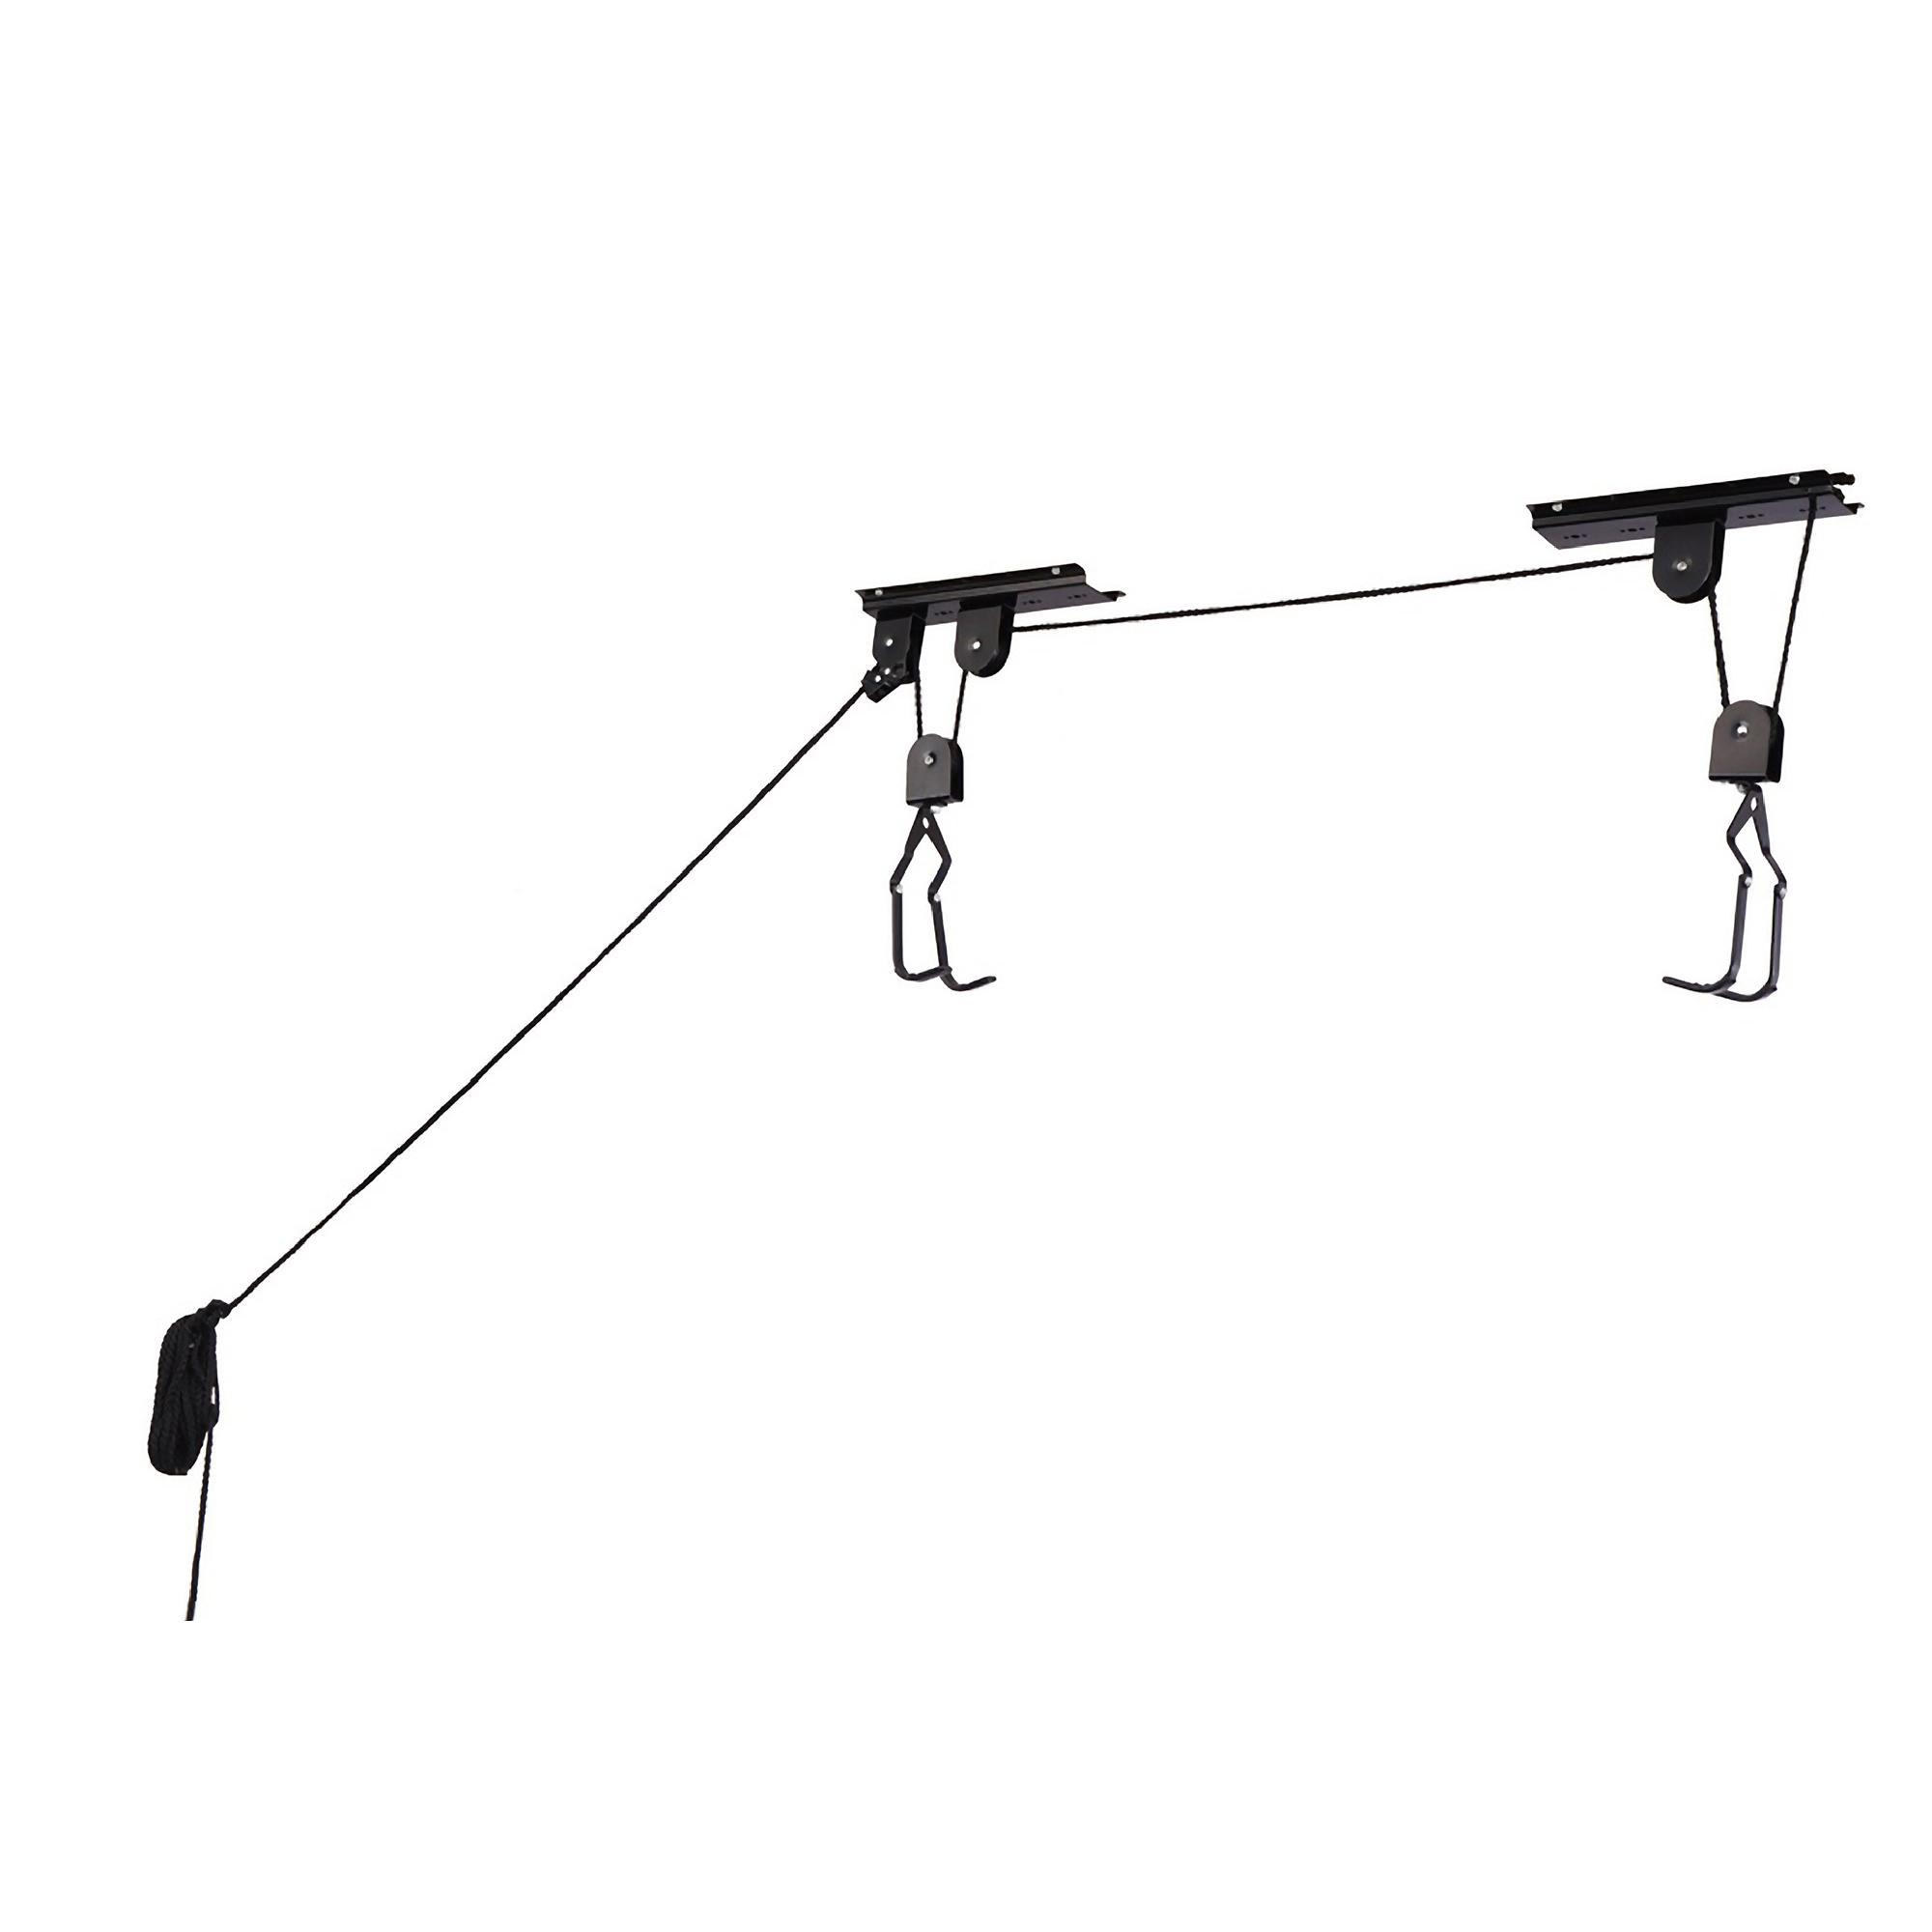 RAD Cycle Products Heavy Duty Bike Lift Hoist For Garage Storage 100lb Capacity Mountain Bicycle Hoist